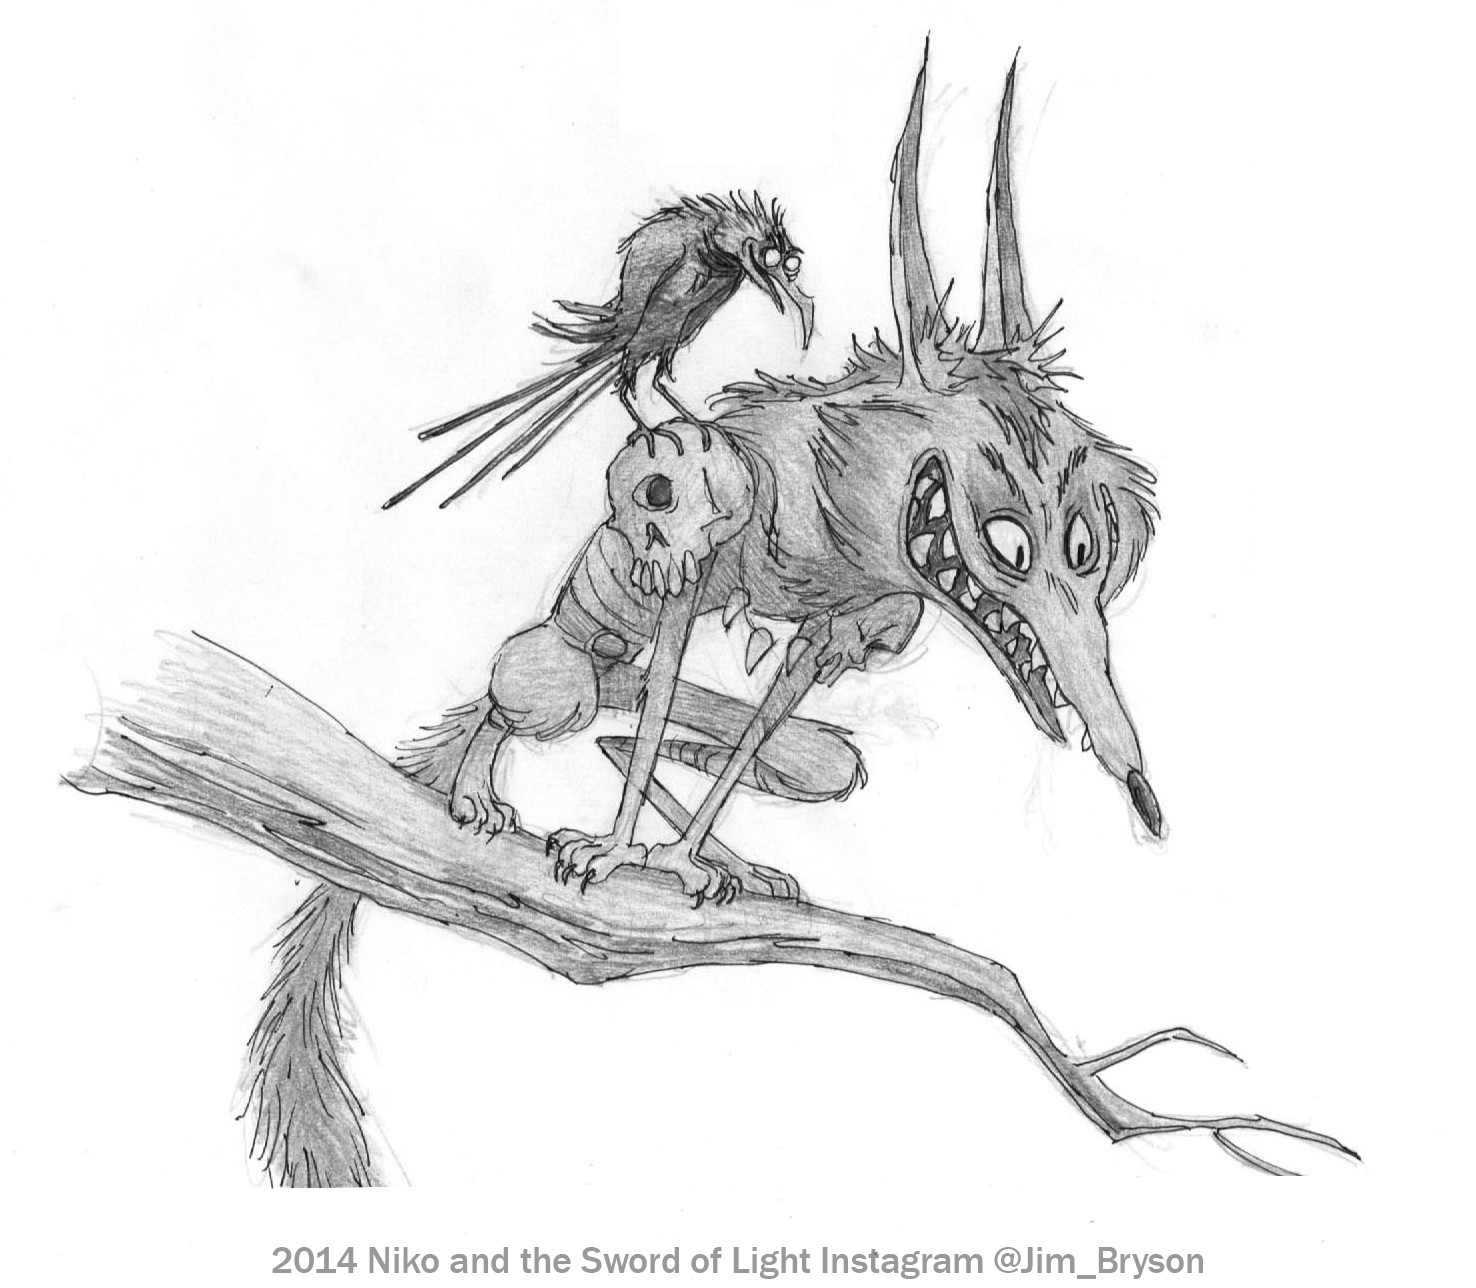 Jim bryson thejackal